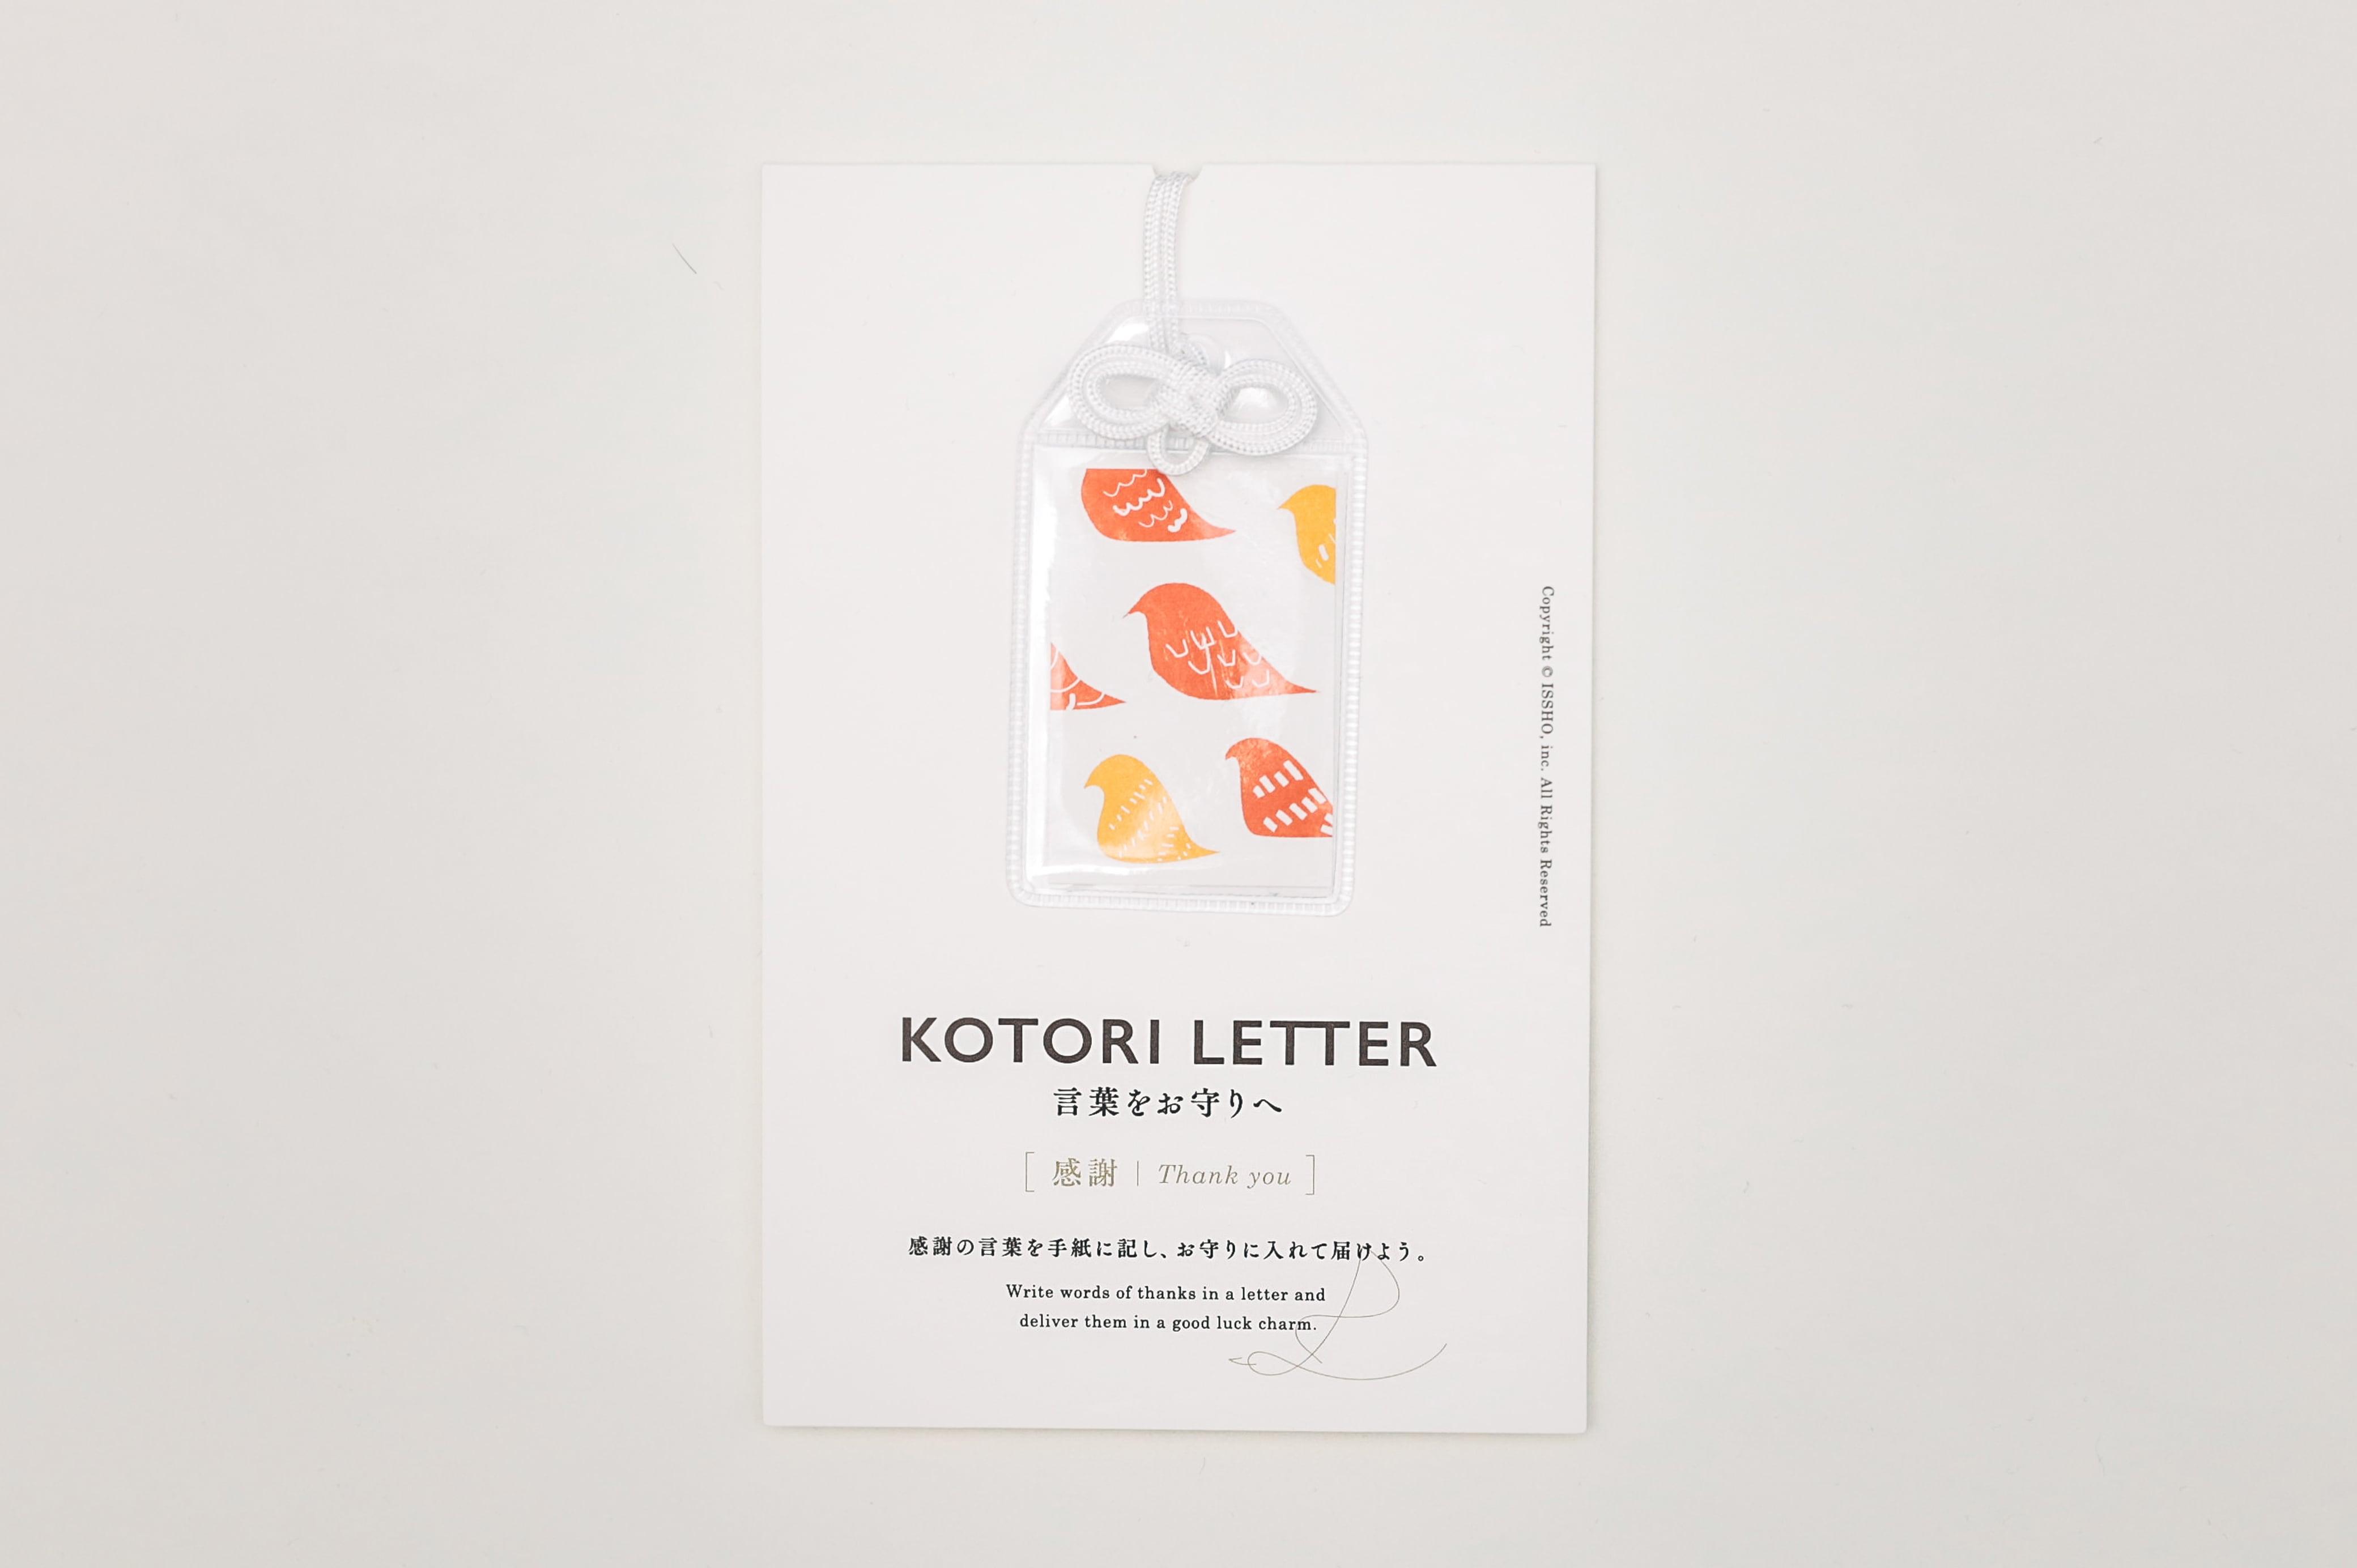 KOTORI LETTER | 感謝 | Thank you | 文鳥 |  Java sparrow